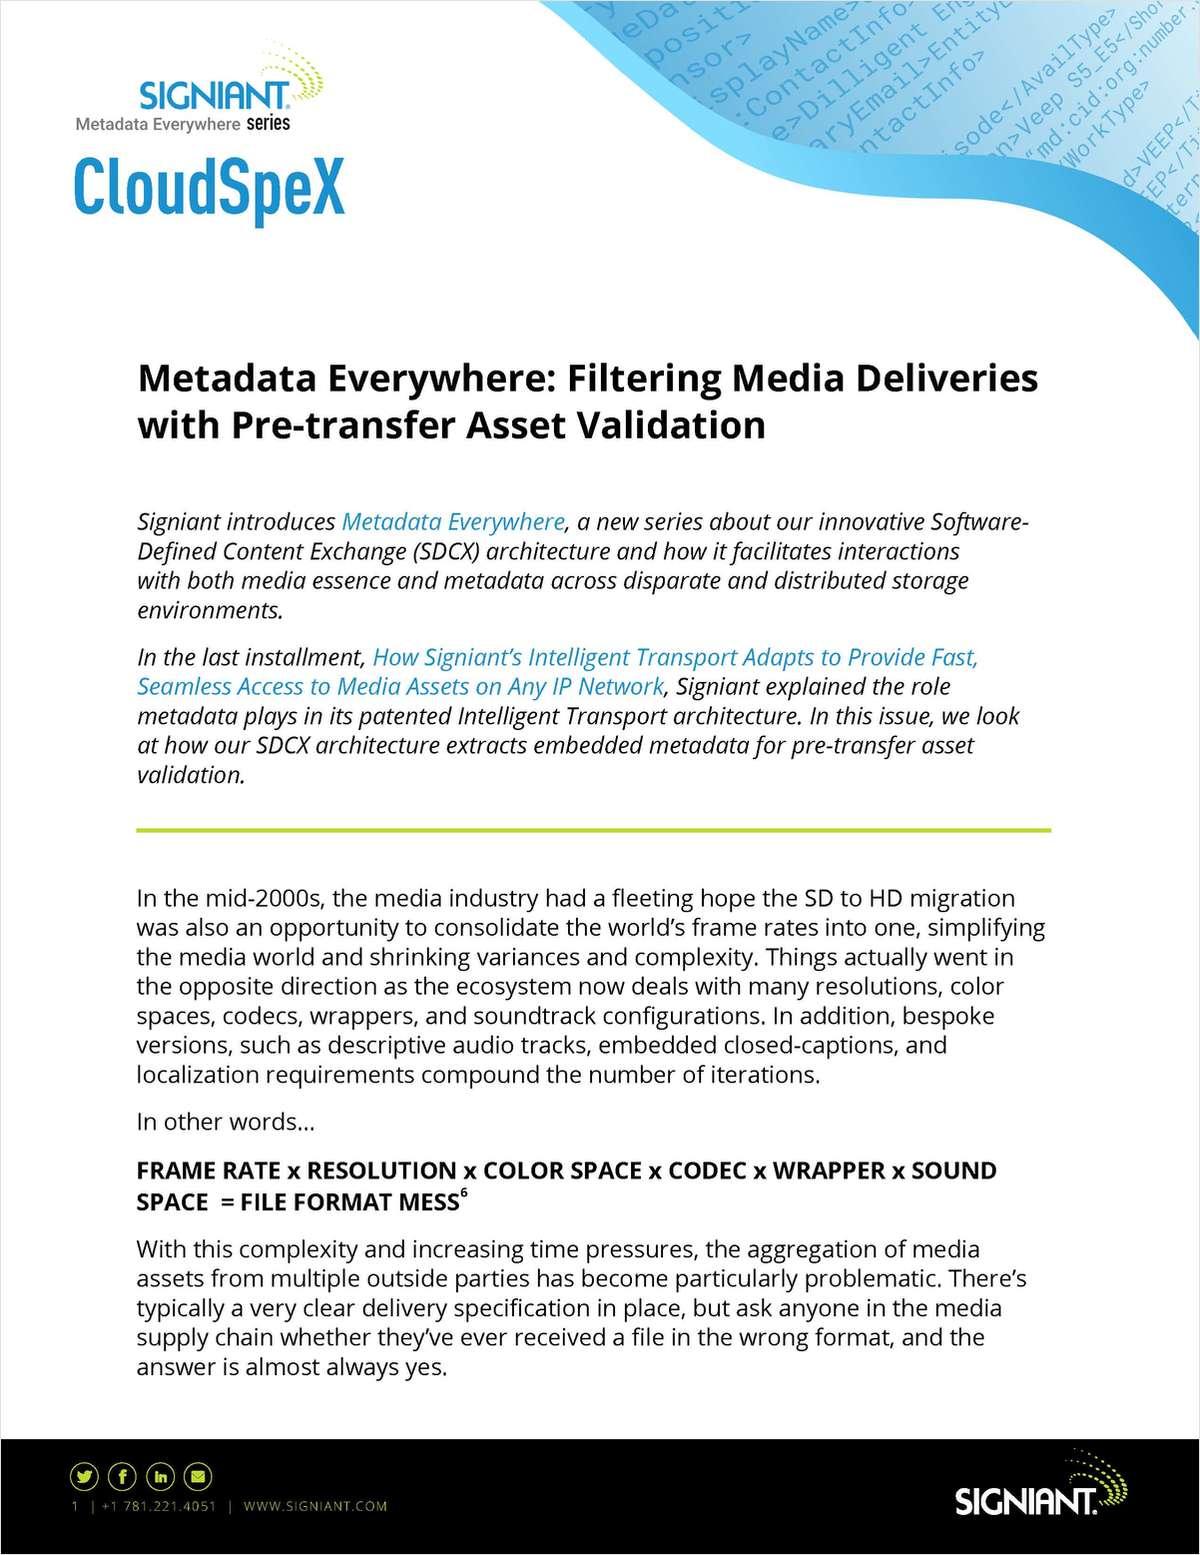 Filtering Media Deliveries with Pre-transfer Asset Validation